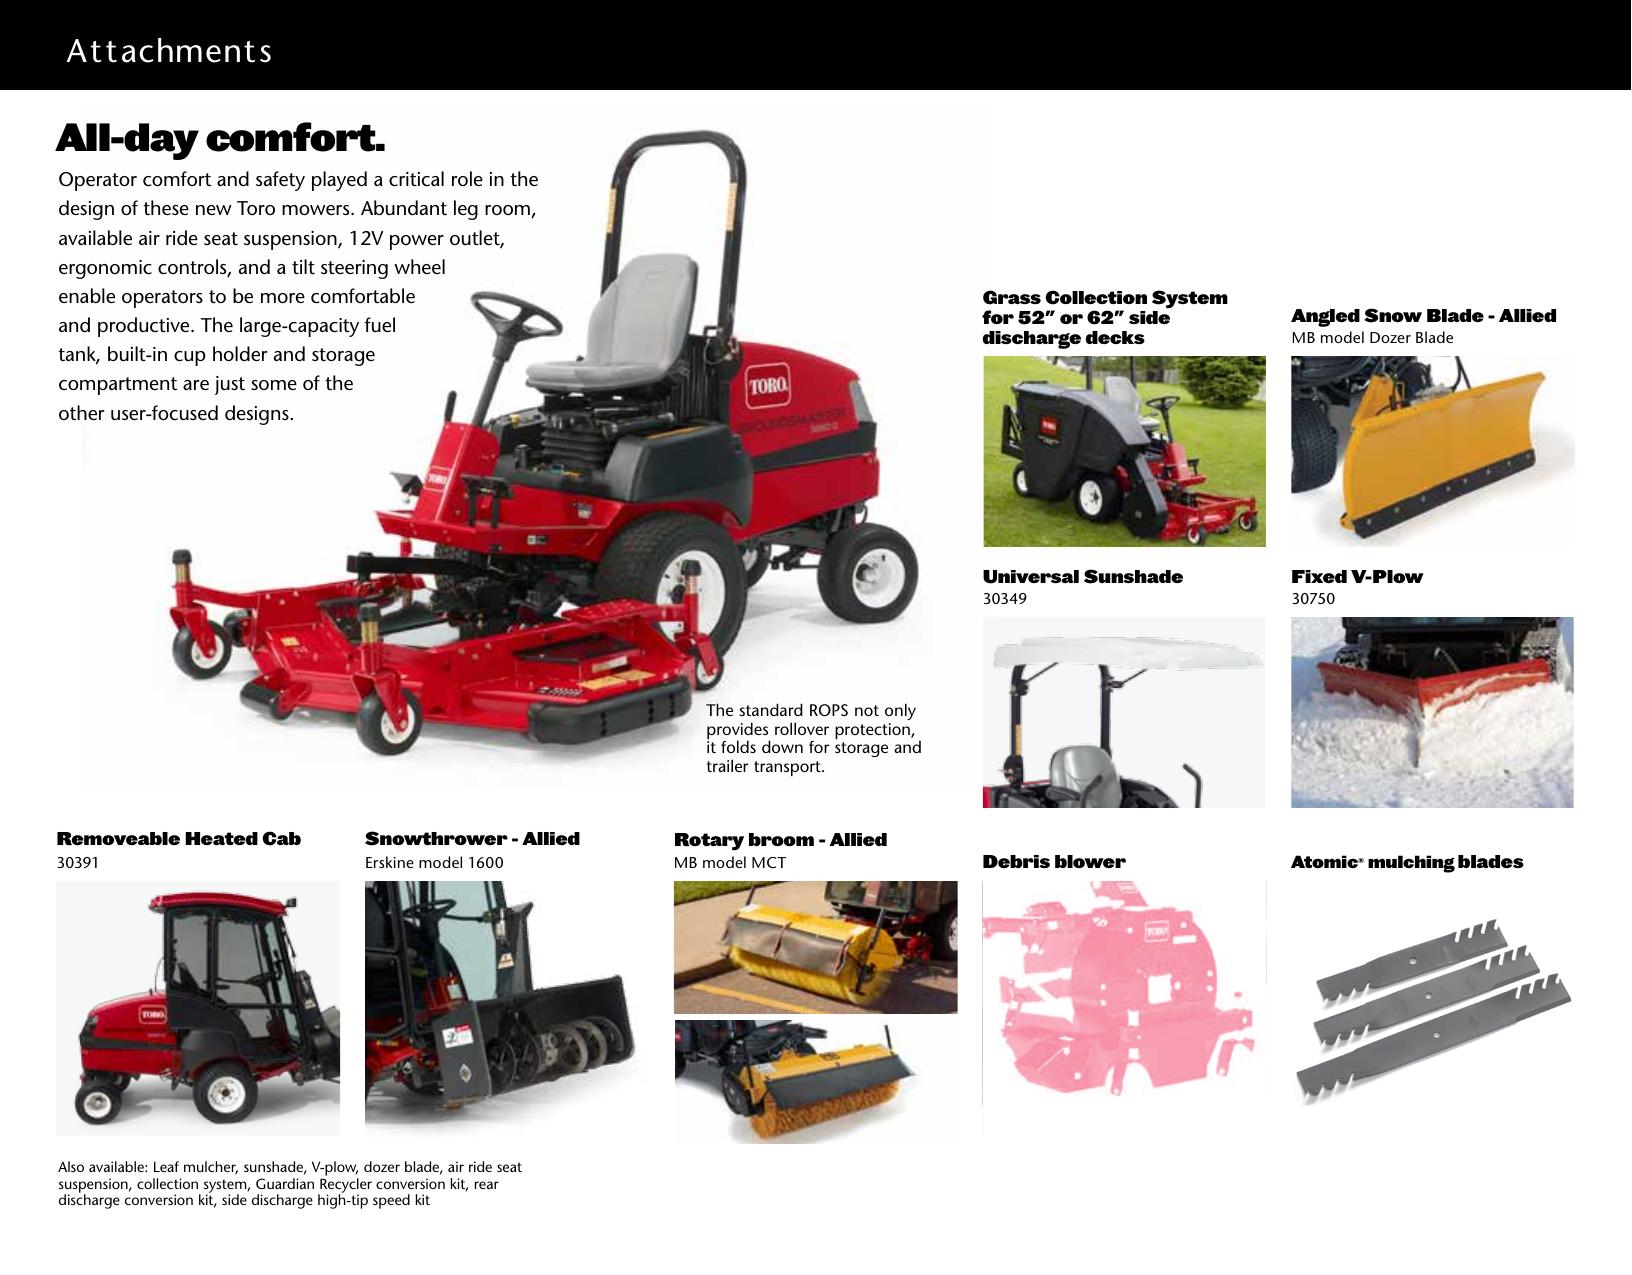 Toro Groundsmaster 3280 D 2Wd 30344 Brochure